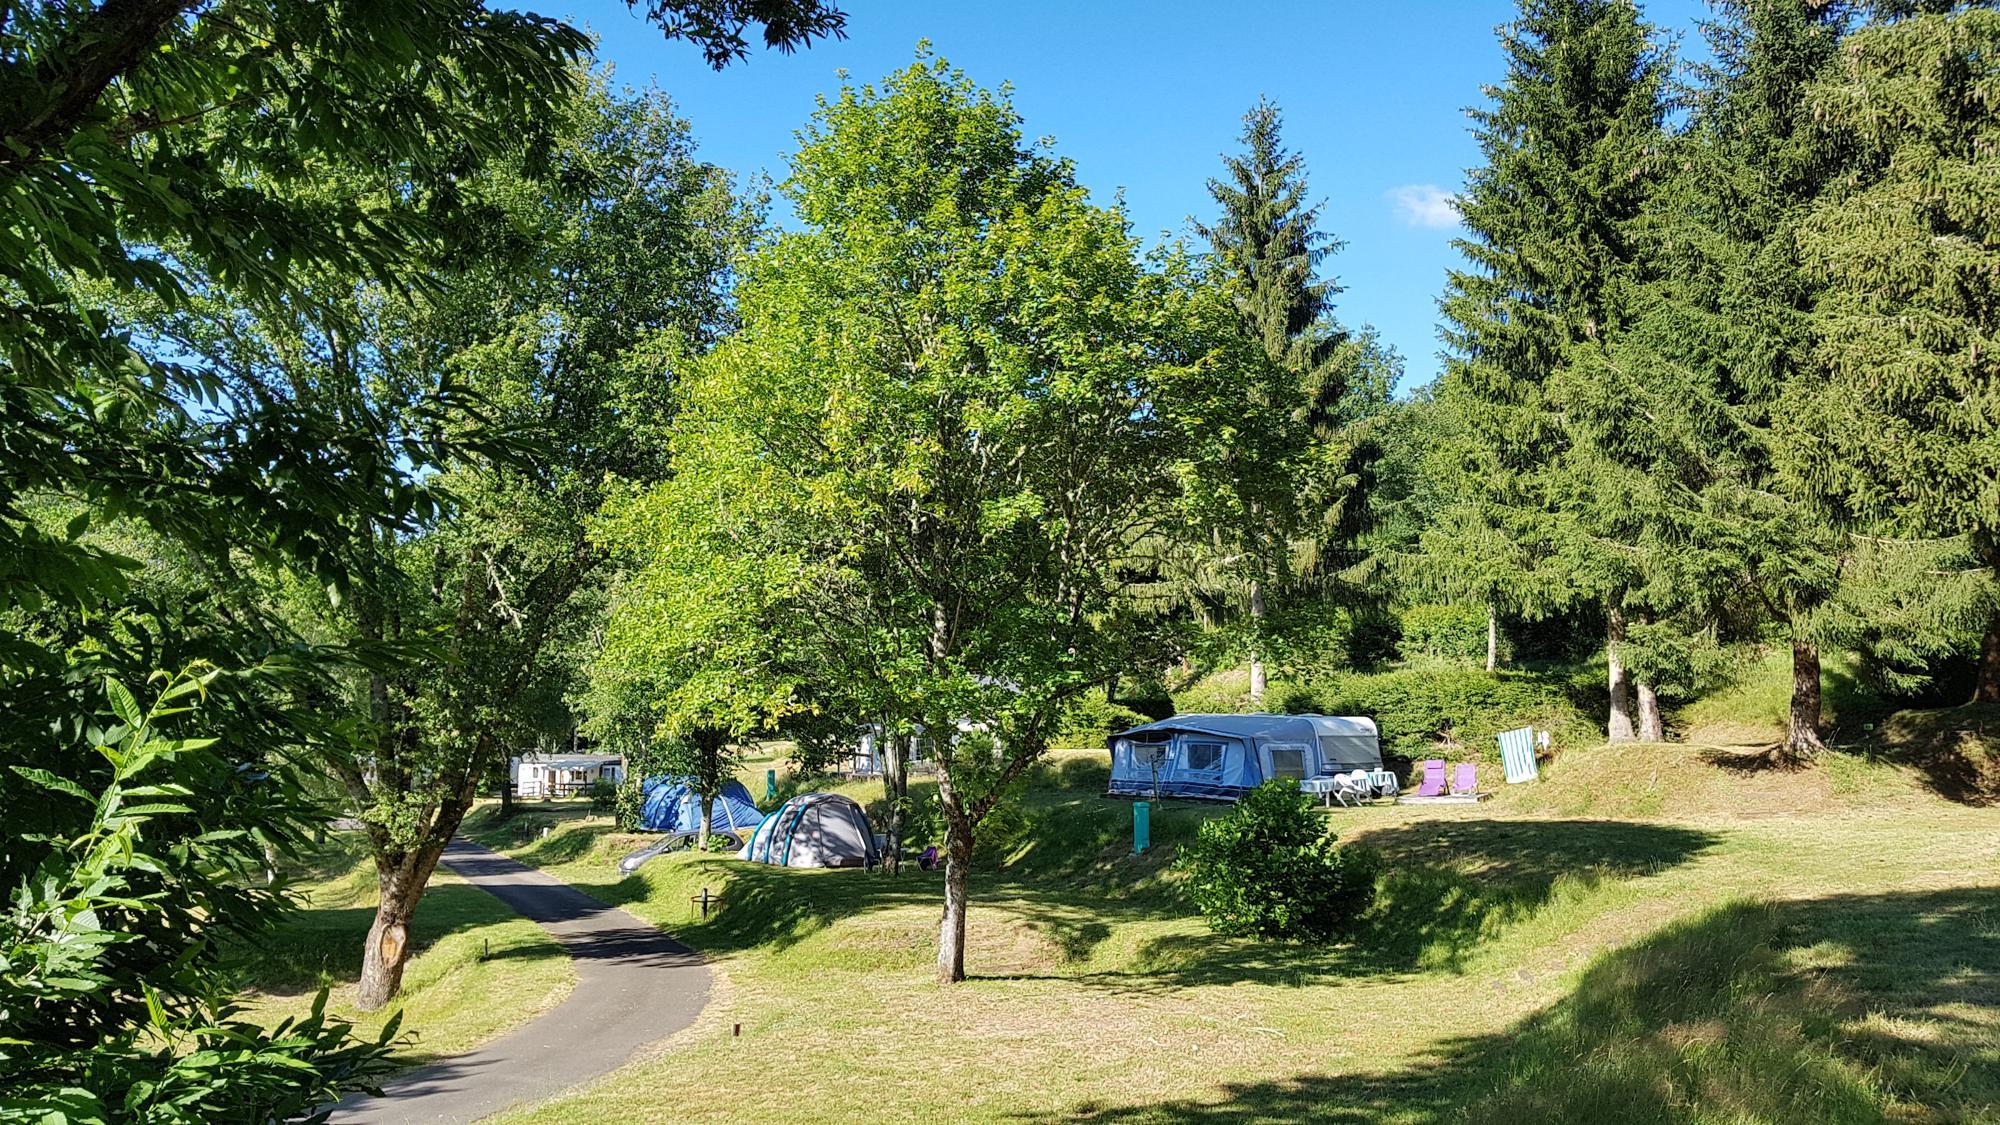 Glamping in Europe – Cool Camping